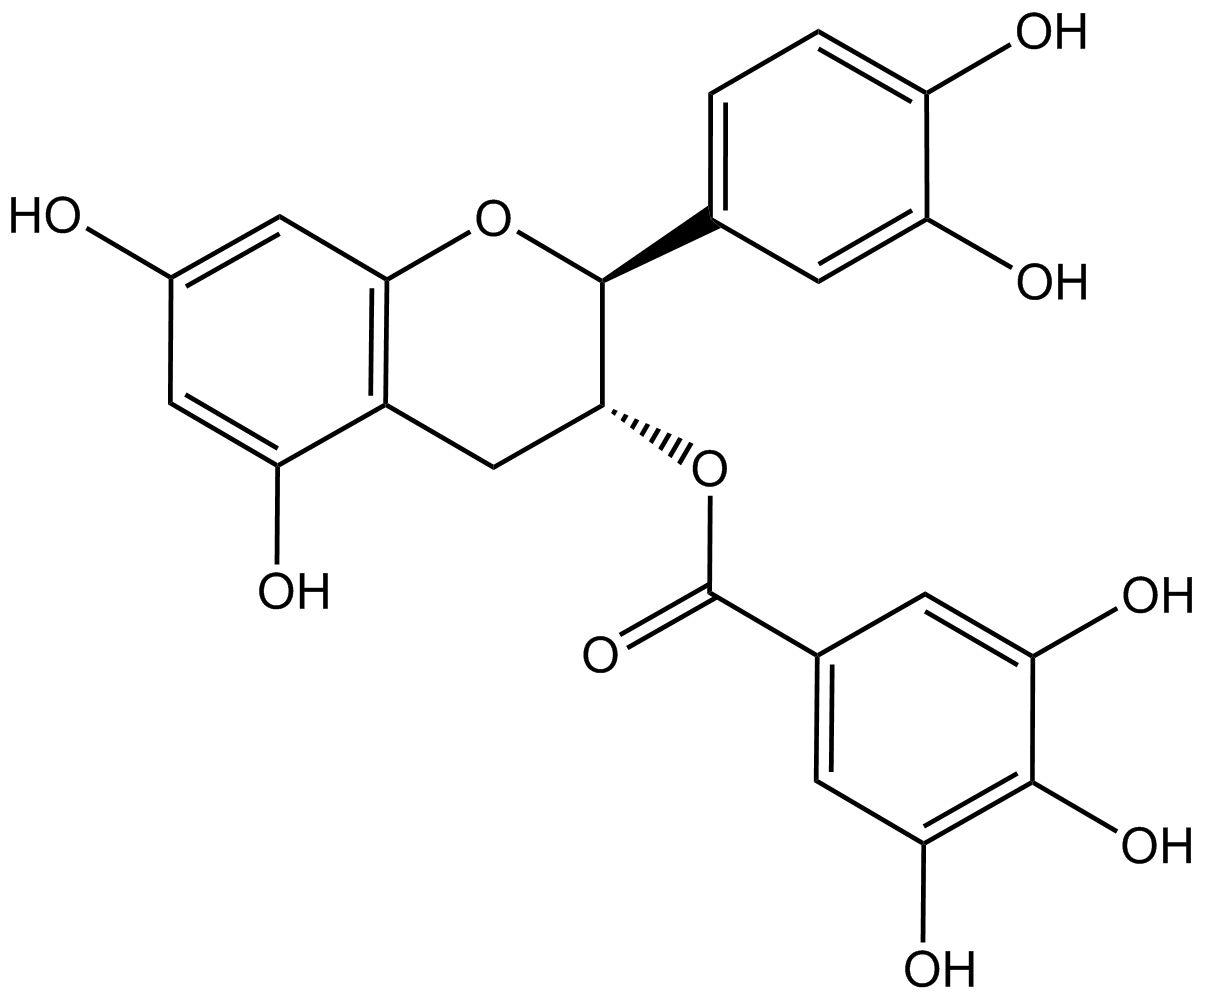 (-)-catechin 3-gallate